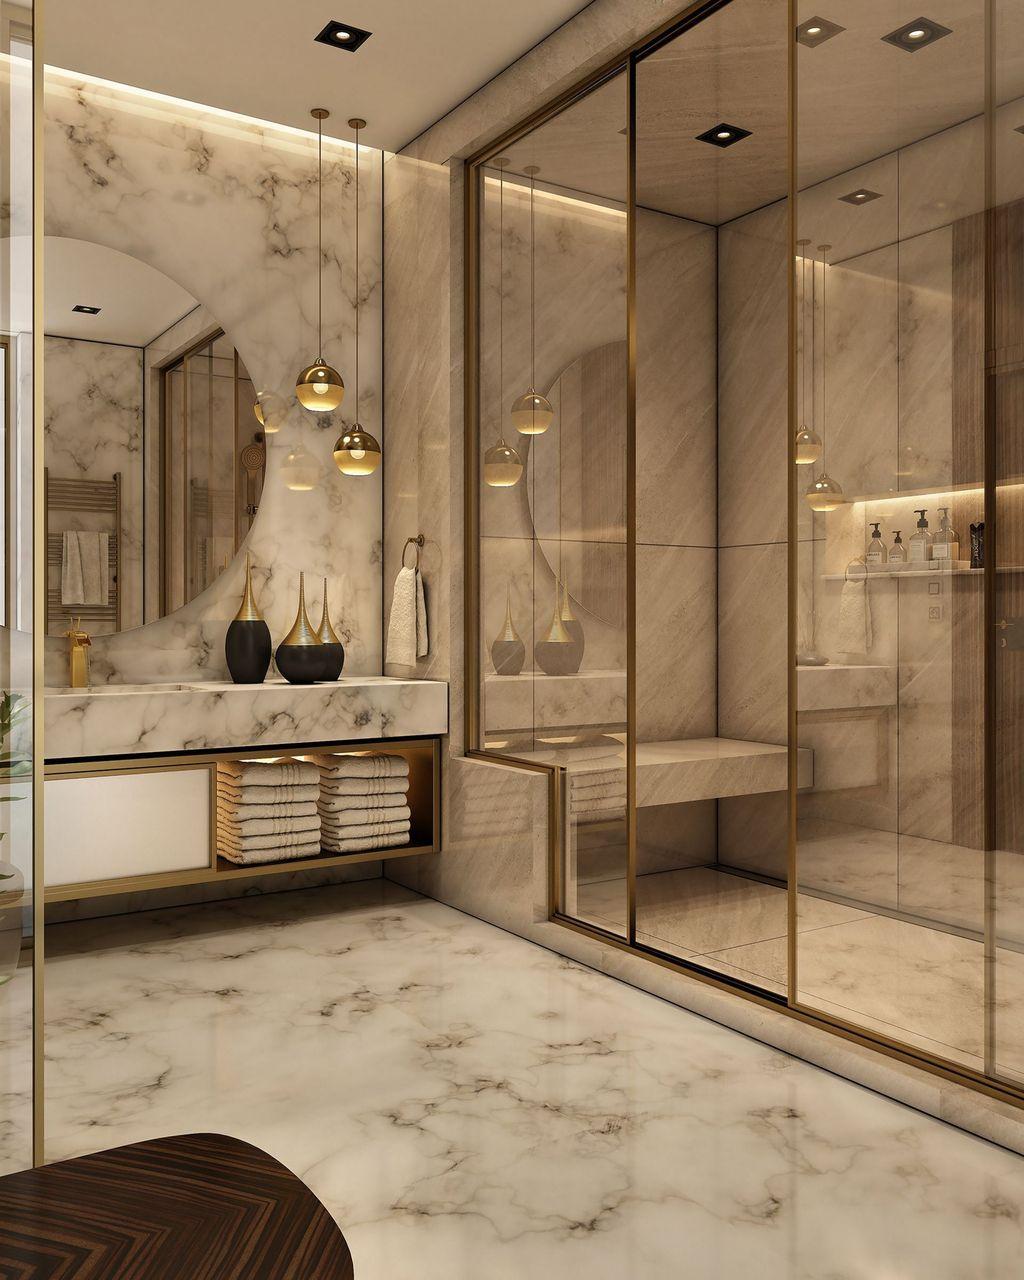 Admirable Modern Interior Design Ideas You Never Seen Before 35